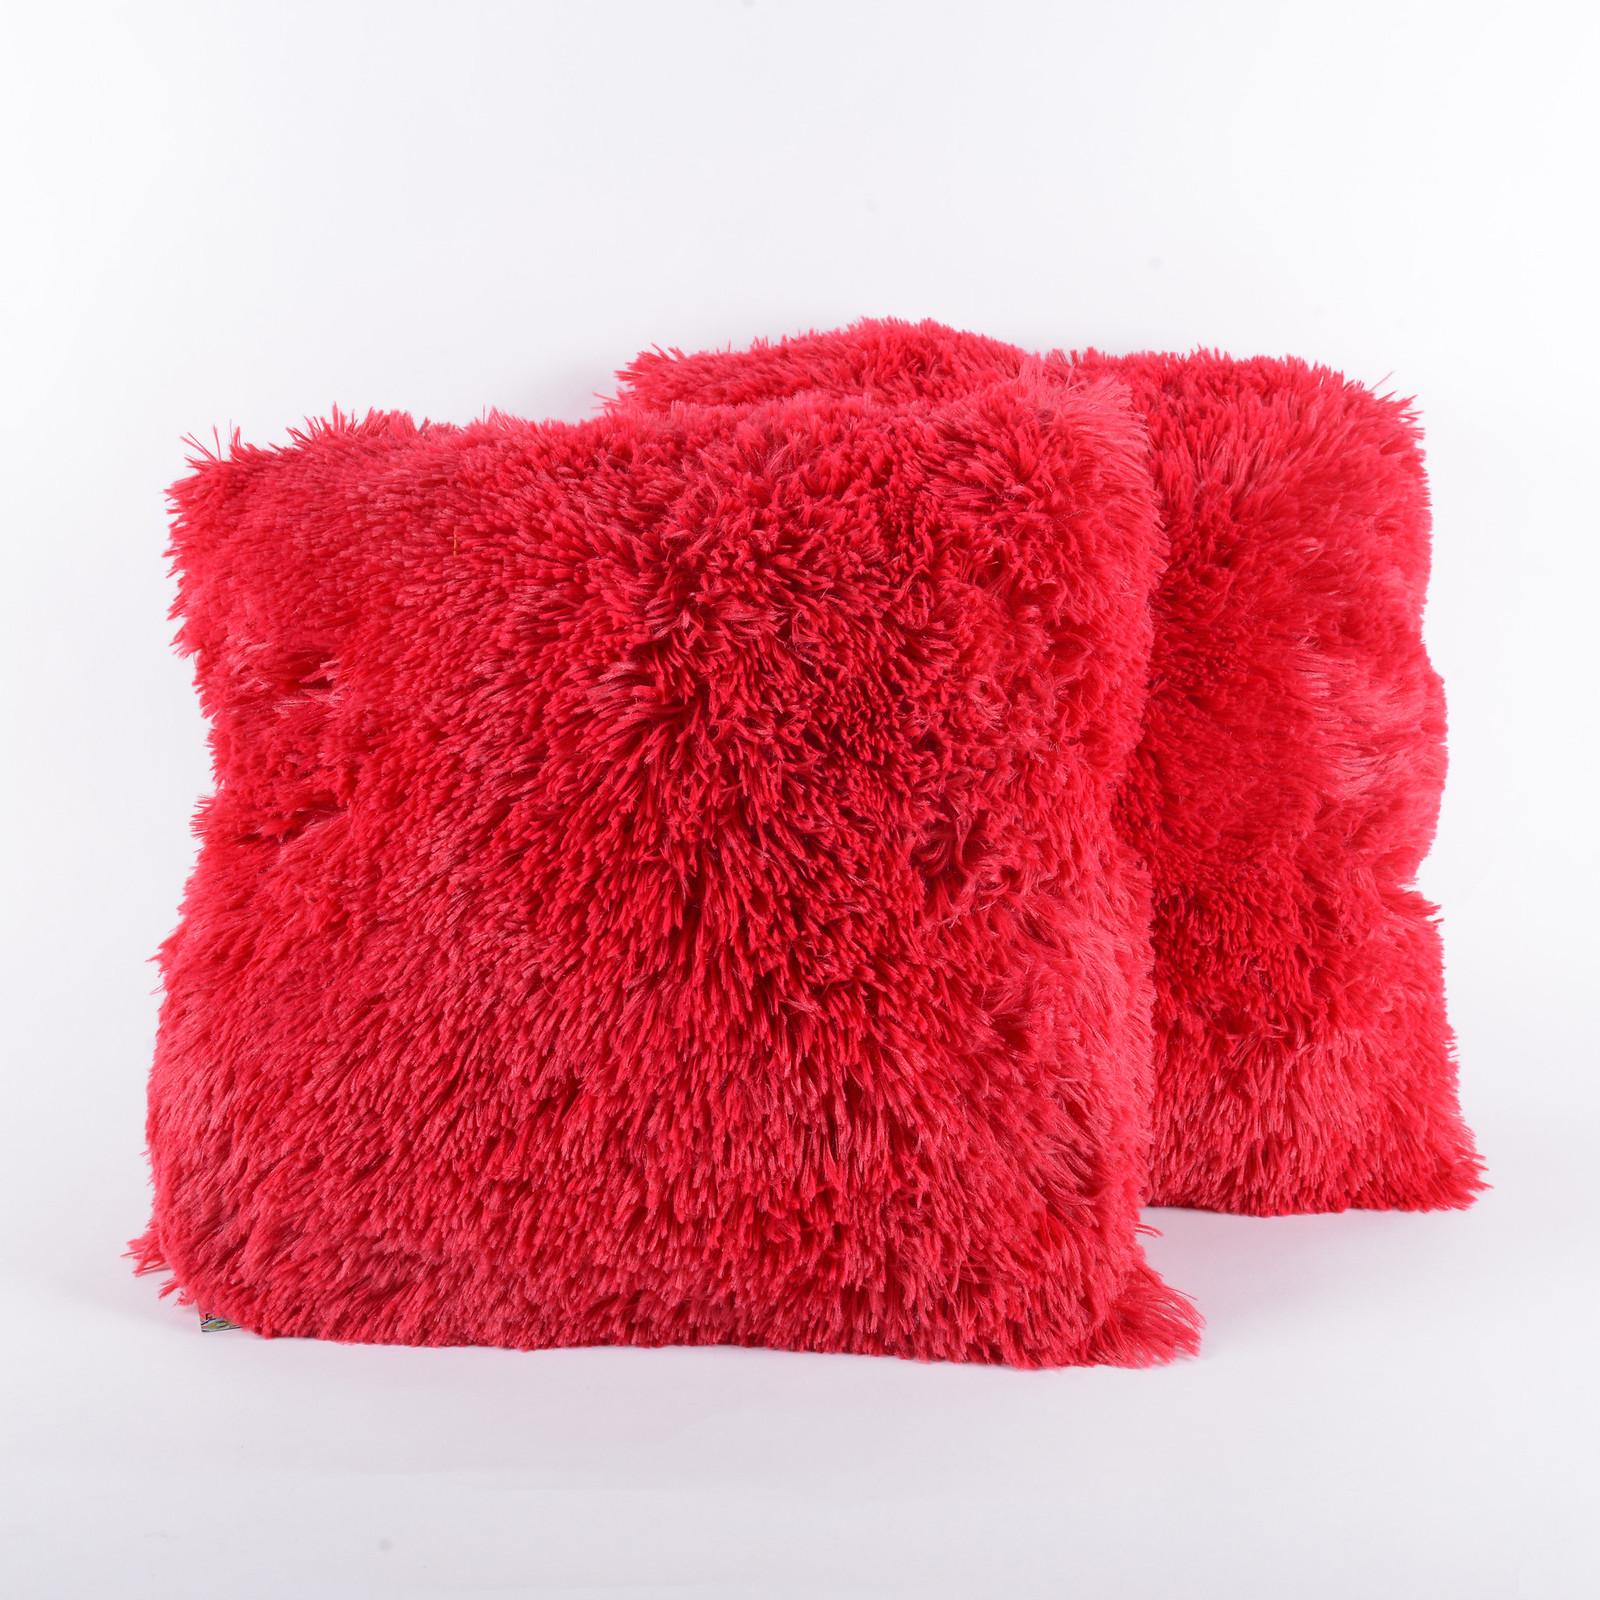 Big Comfortable Throw Pillows : Very Soft Comfy Plush Long Faux Fur 18